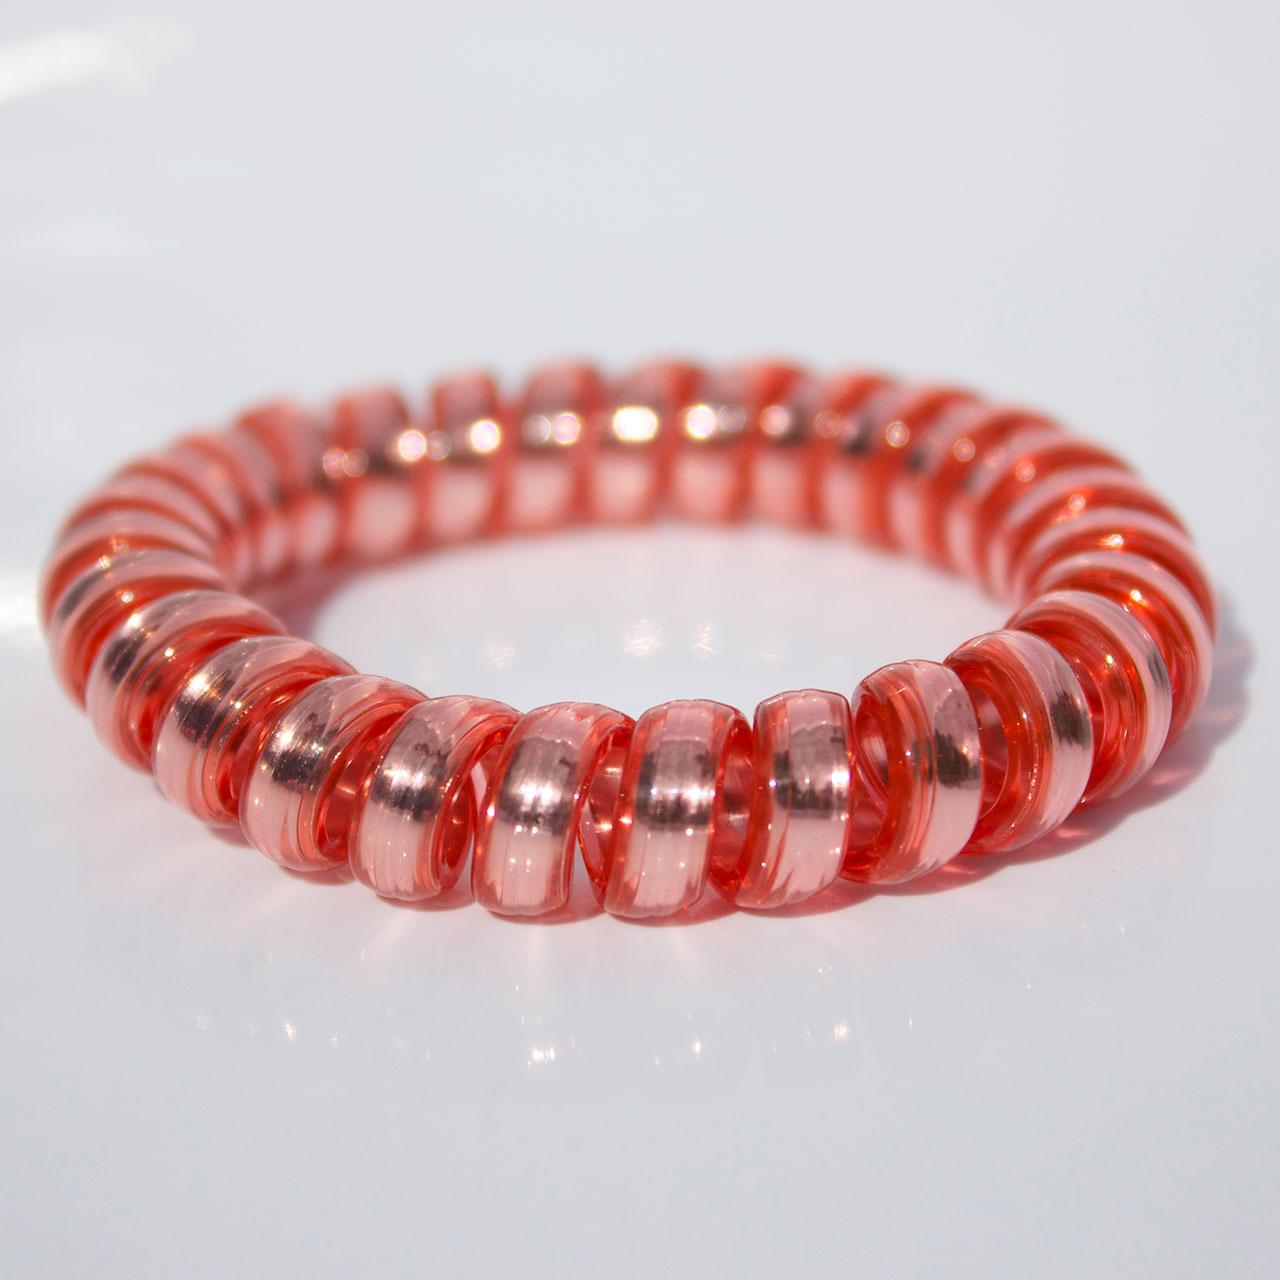 Ružovo zlatá gumička do vlasov Hairfix - Metallic Rose Gold